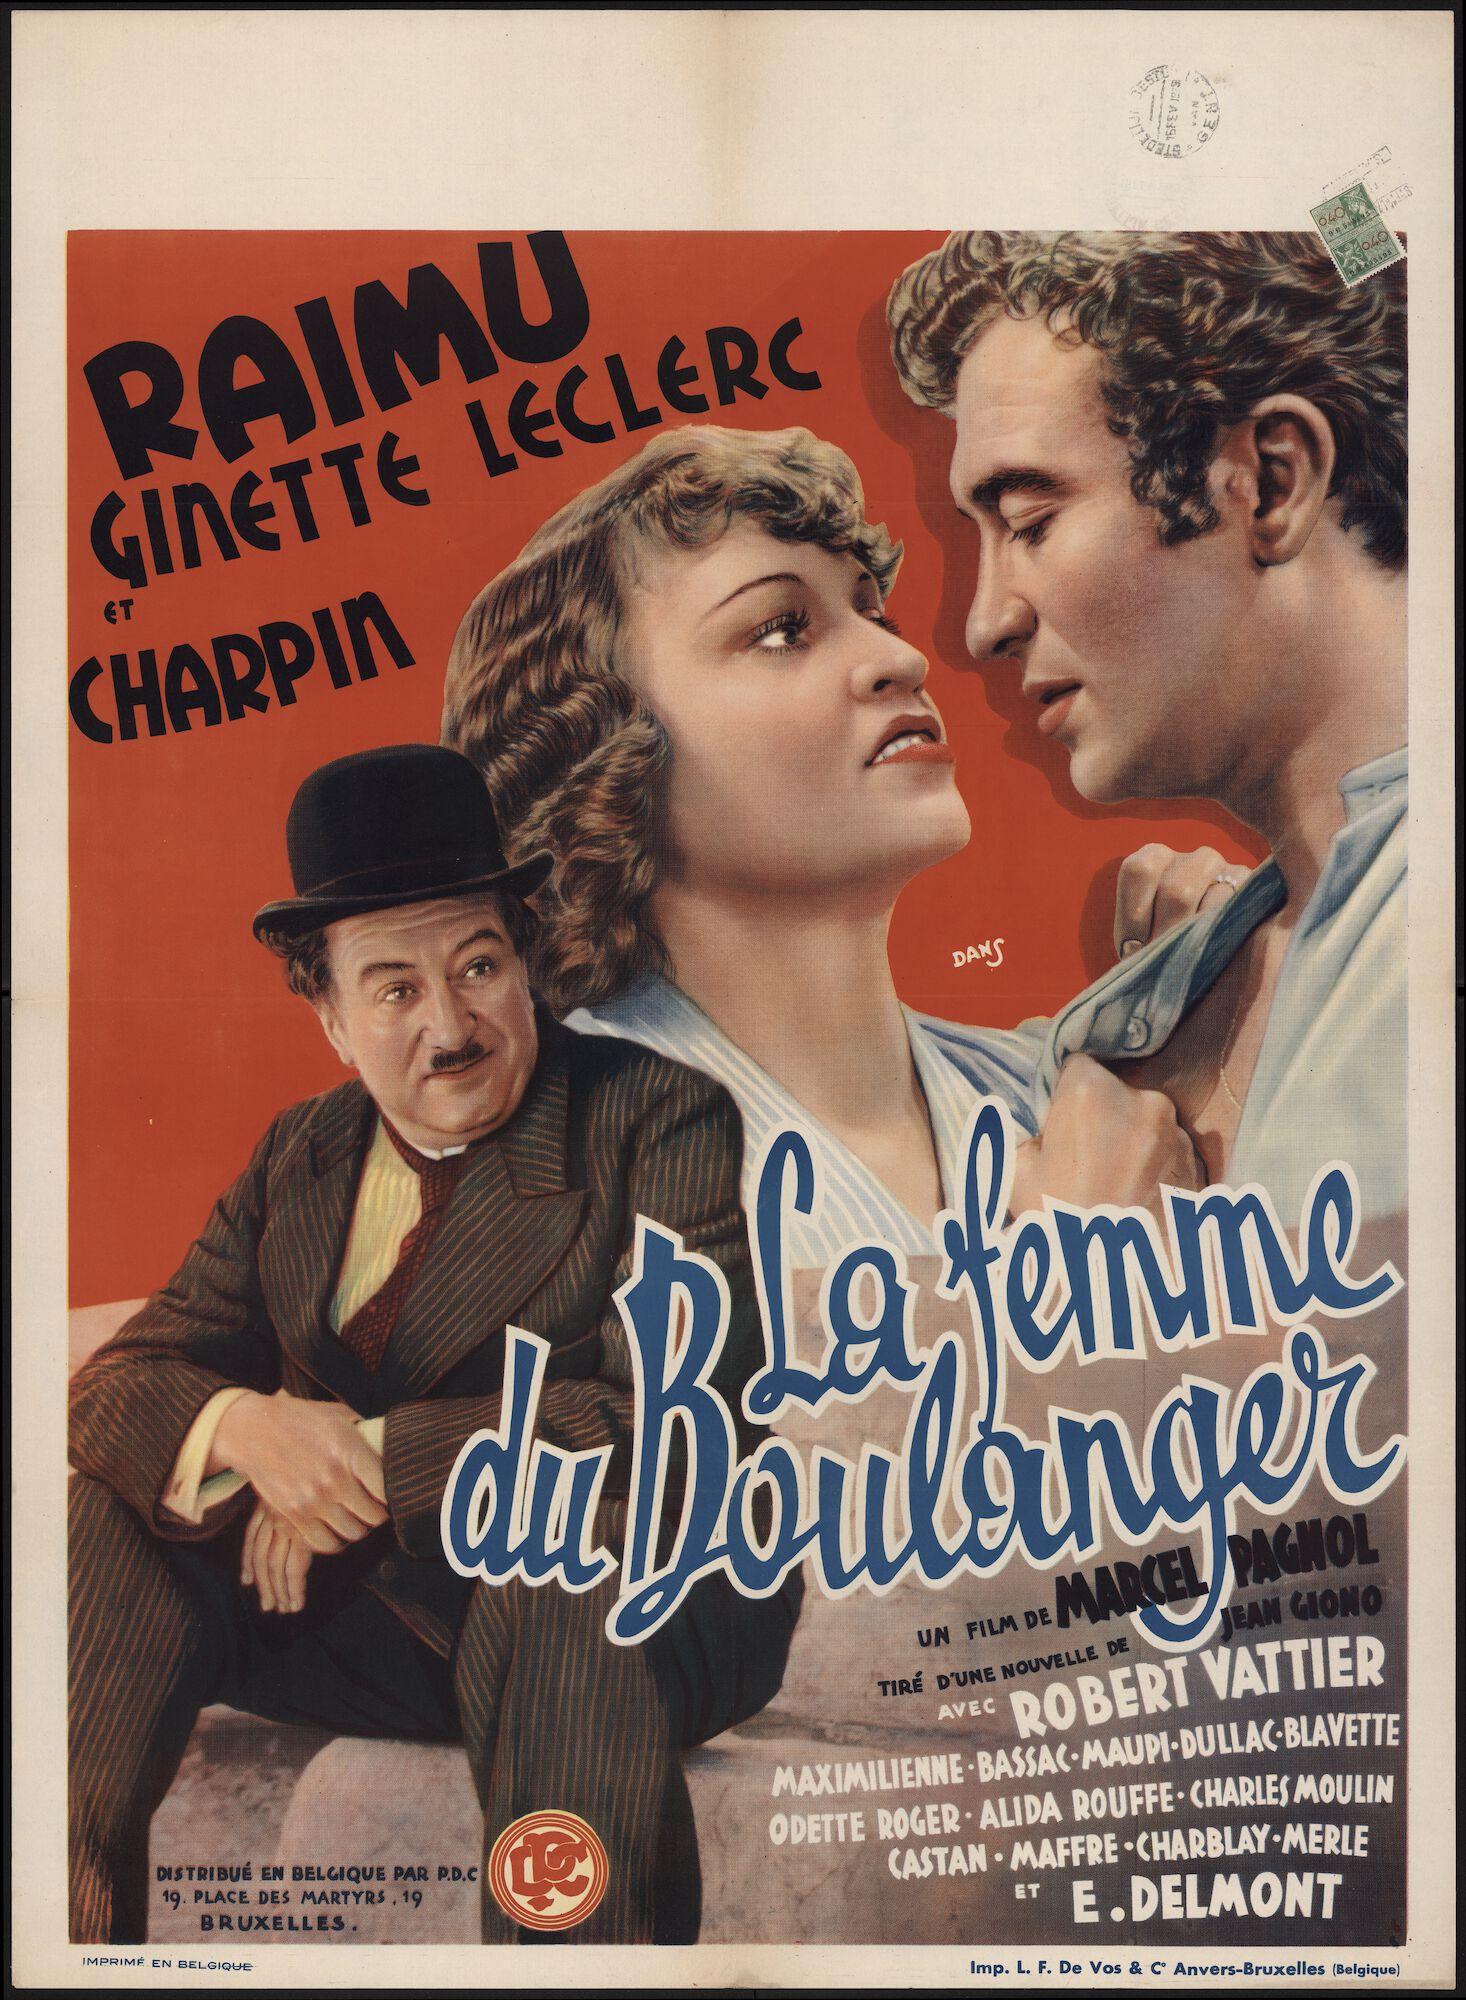 La femme du boulanger, Gent, februari 1939